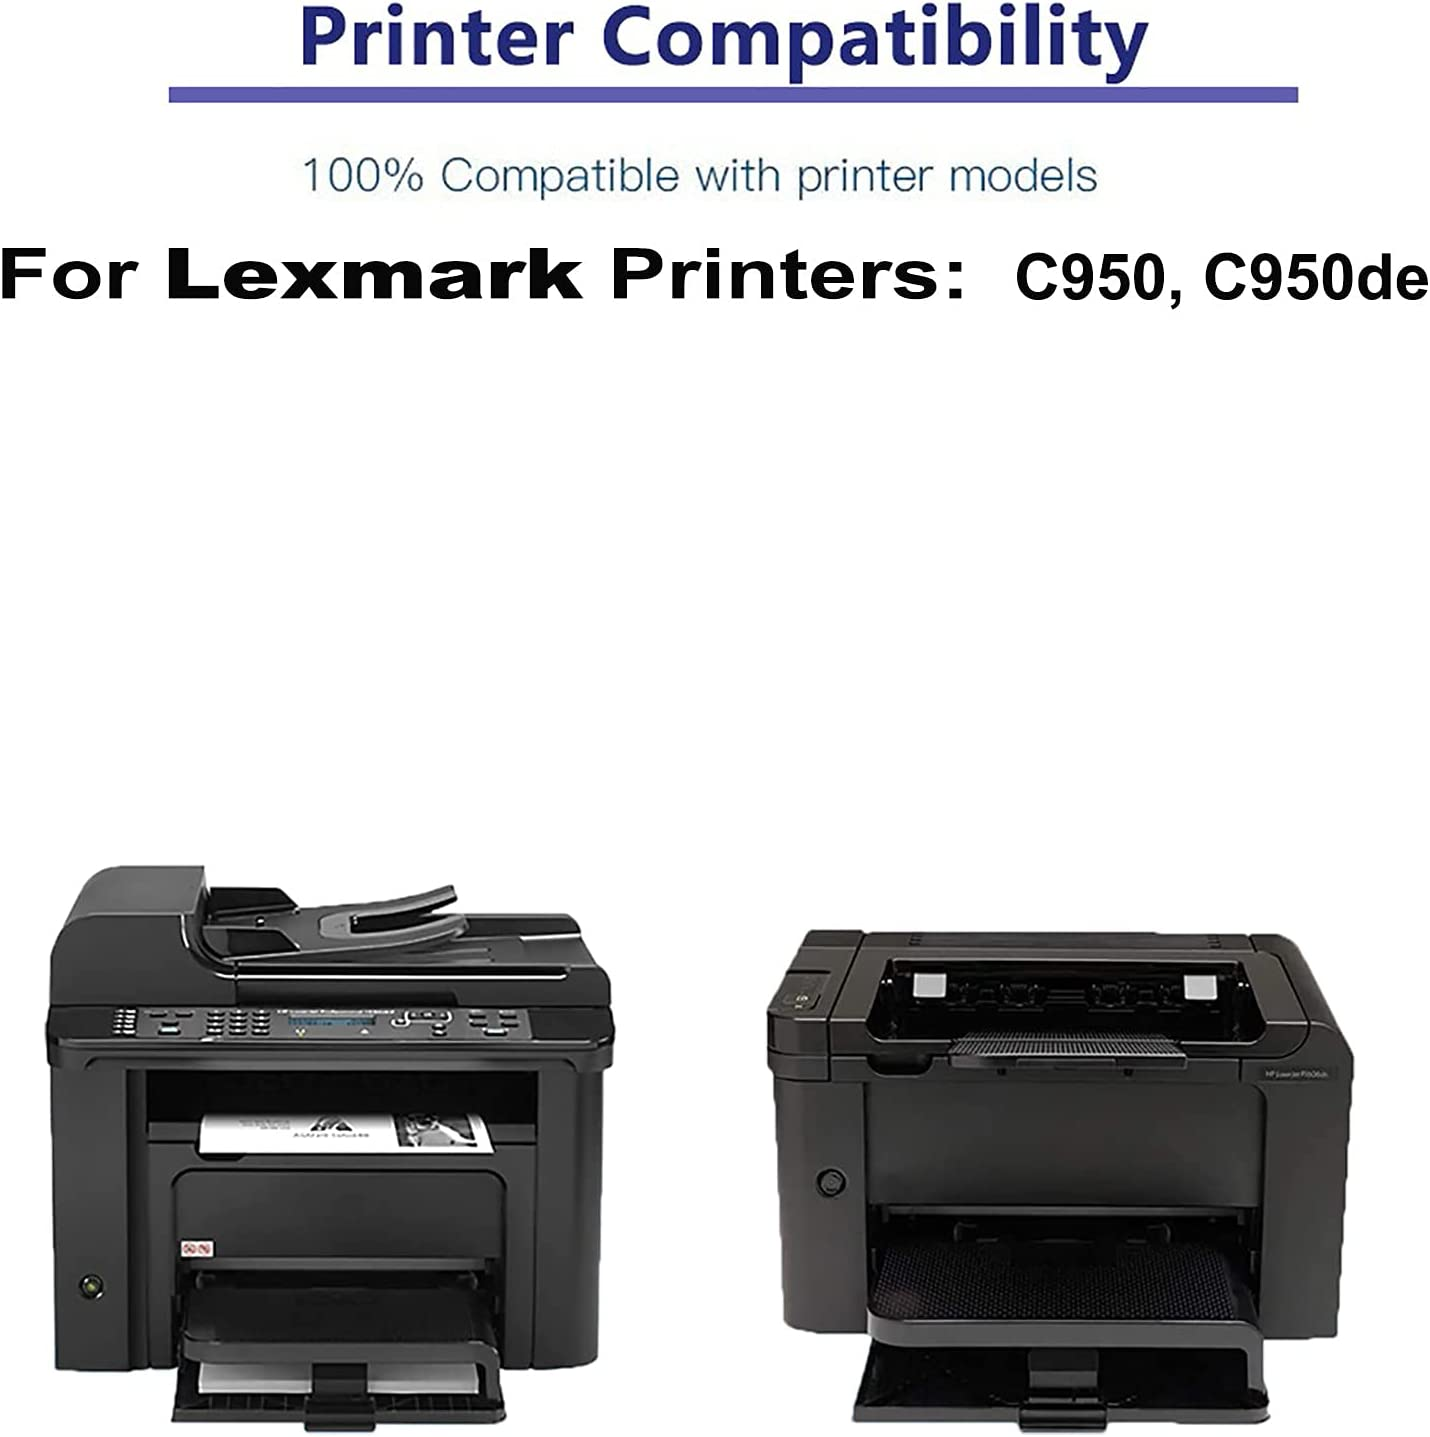 1-Pack (Yellow) Compatible High Yield C950X1YG Laser Printer Toner Cartridge Used for Lexmark C950, C950de Printer